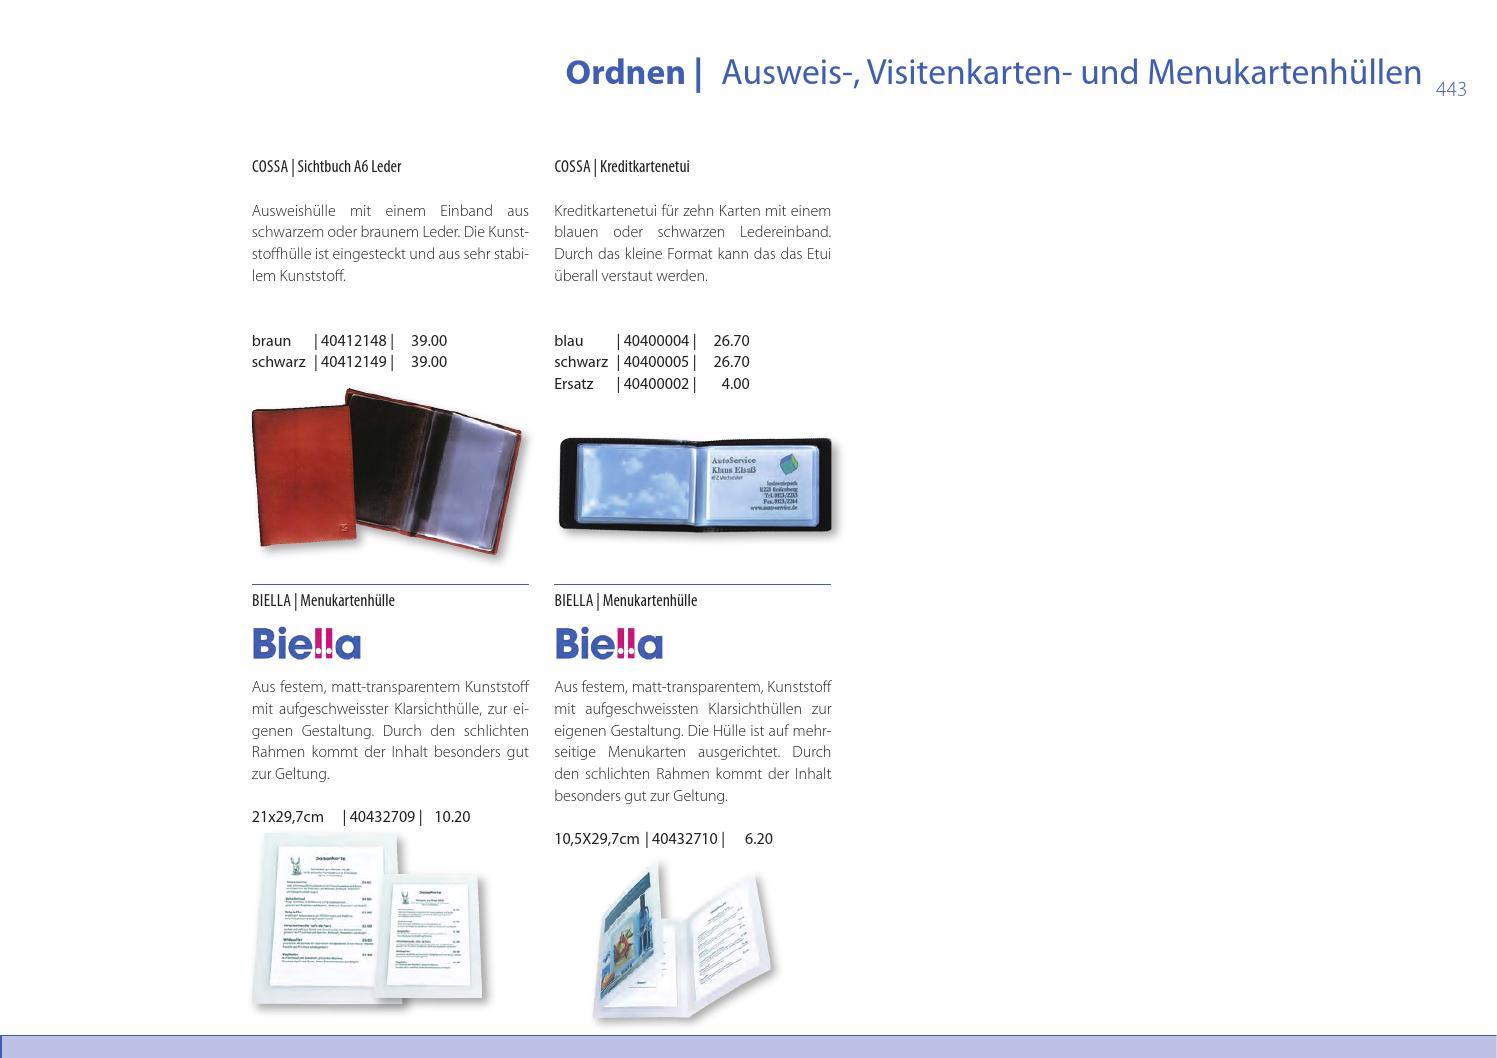 Schön Zehn Rahmen Karten Fotos - Benutzerdefinierte Bilderrahmen ...